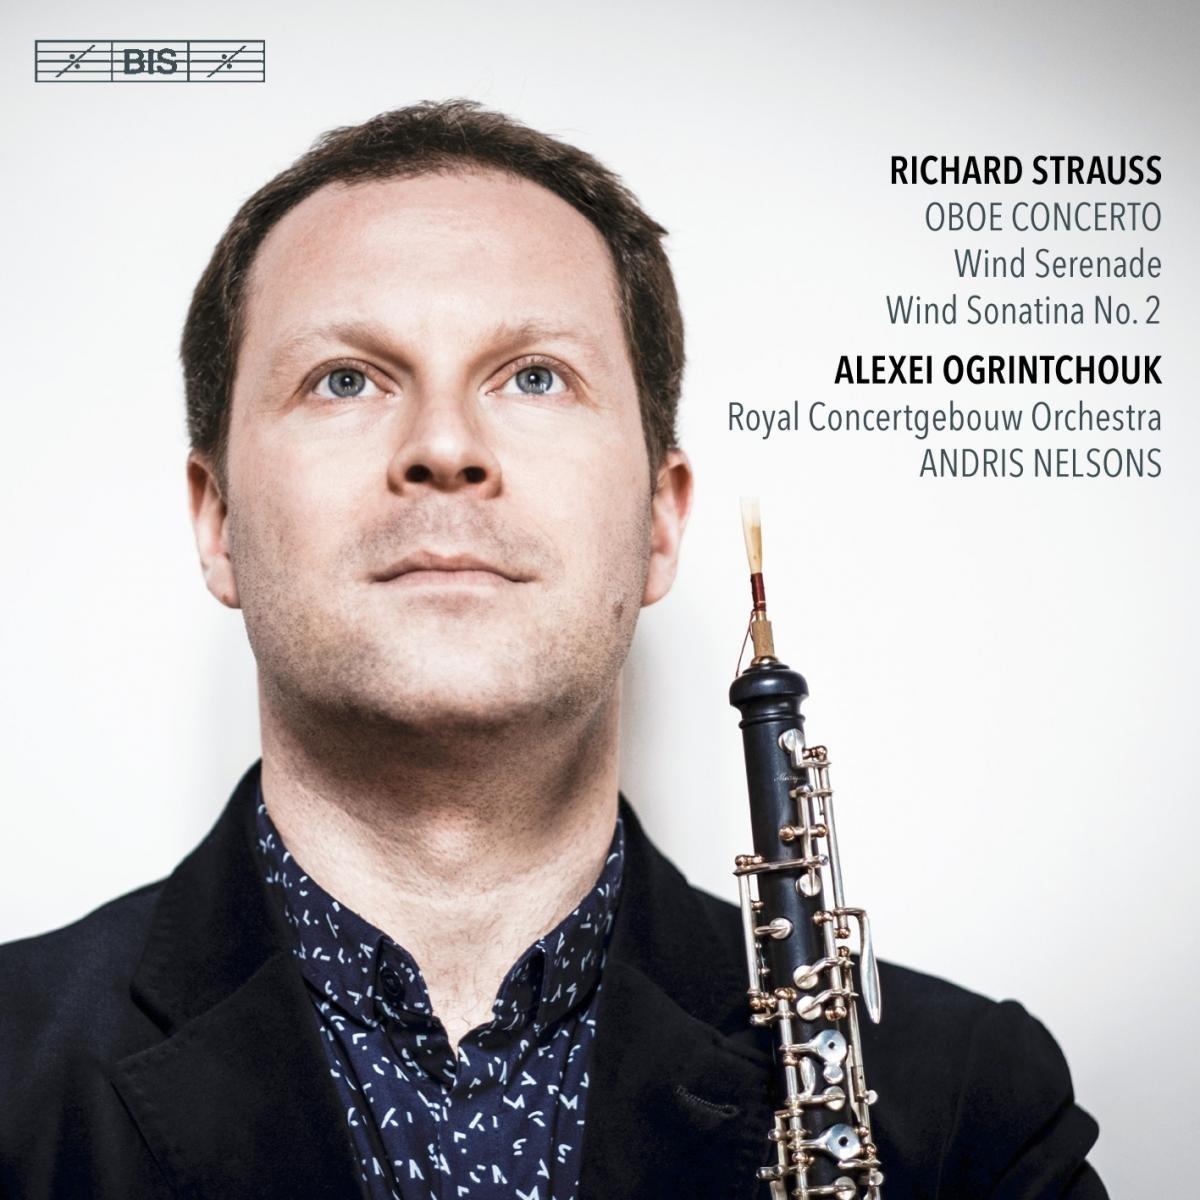 SACD : Alexei Ogrintchouk - Royal Concertgebouw Orchestra - Richard Strauss: Oboe Concerto (Hybrid SACD)